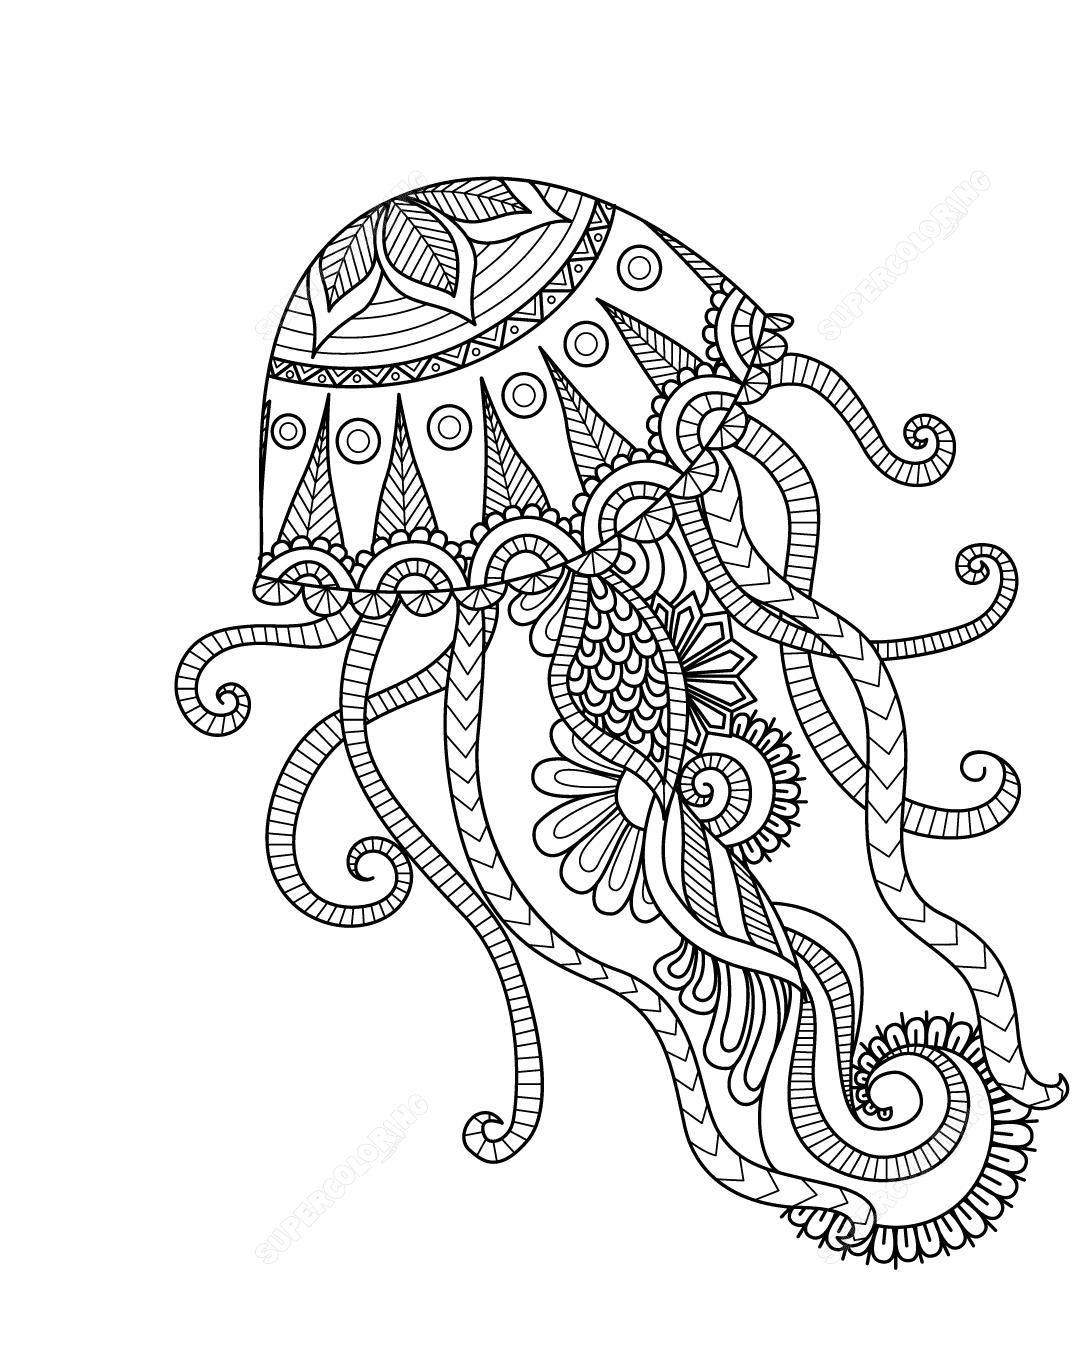 Jellyfish Mandala Coloring Page Free Printable Coloring